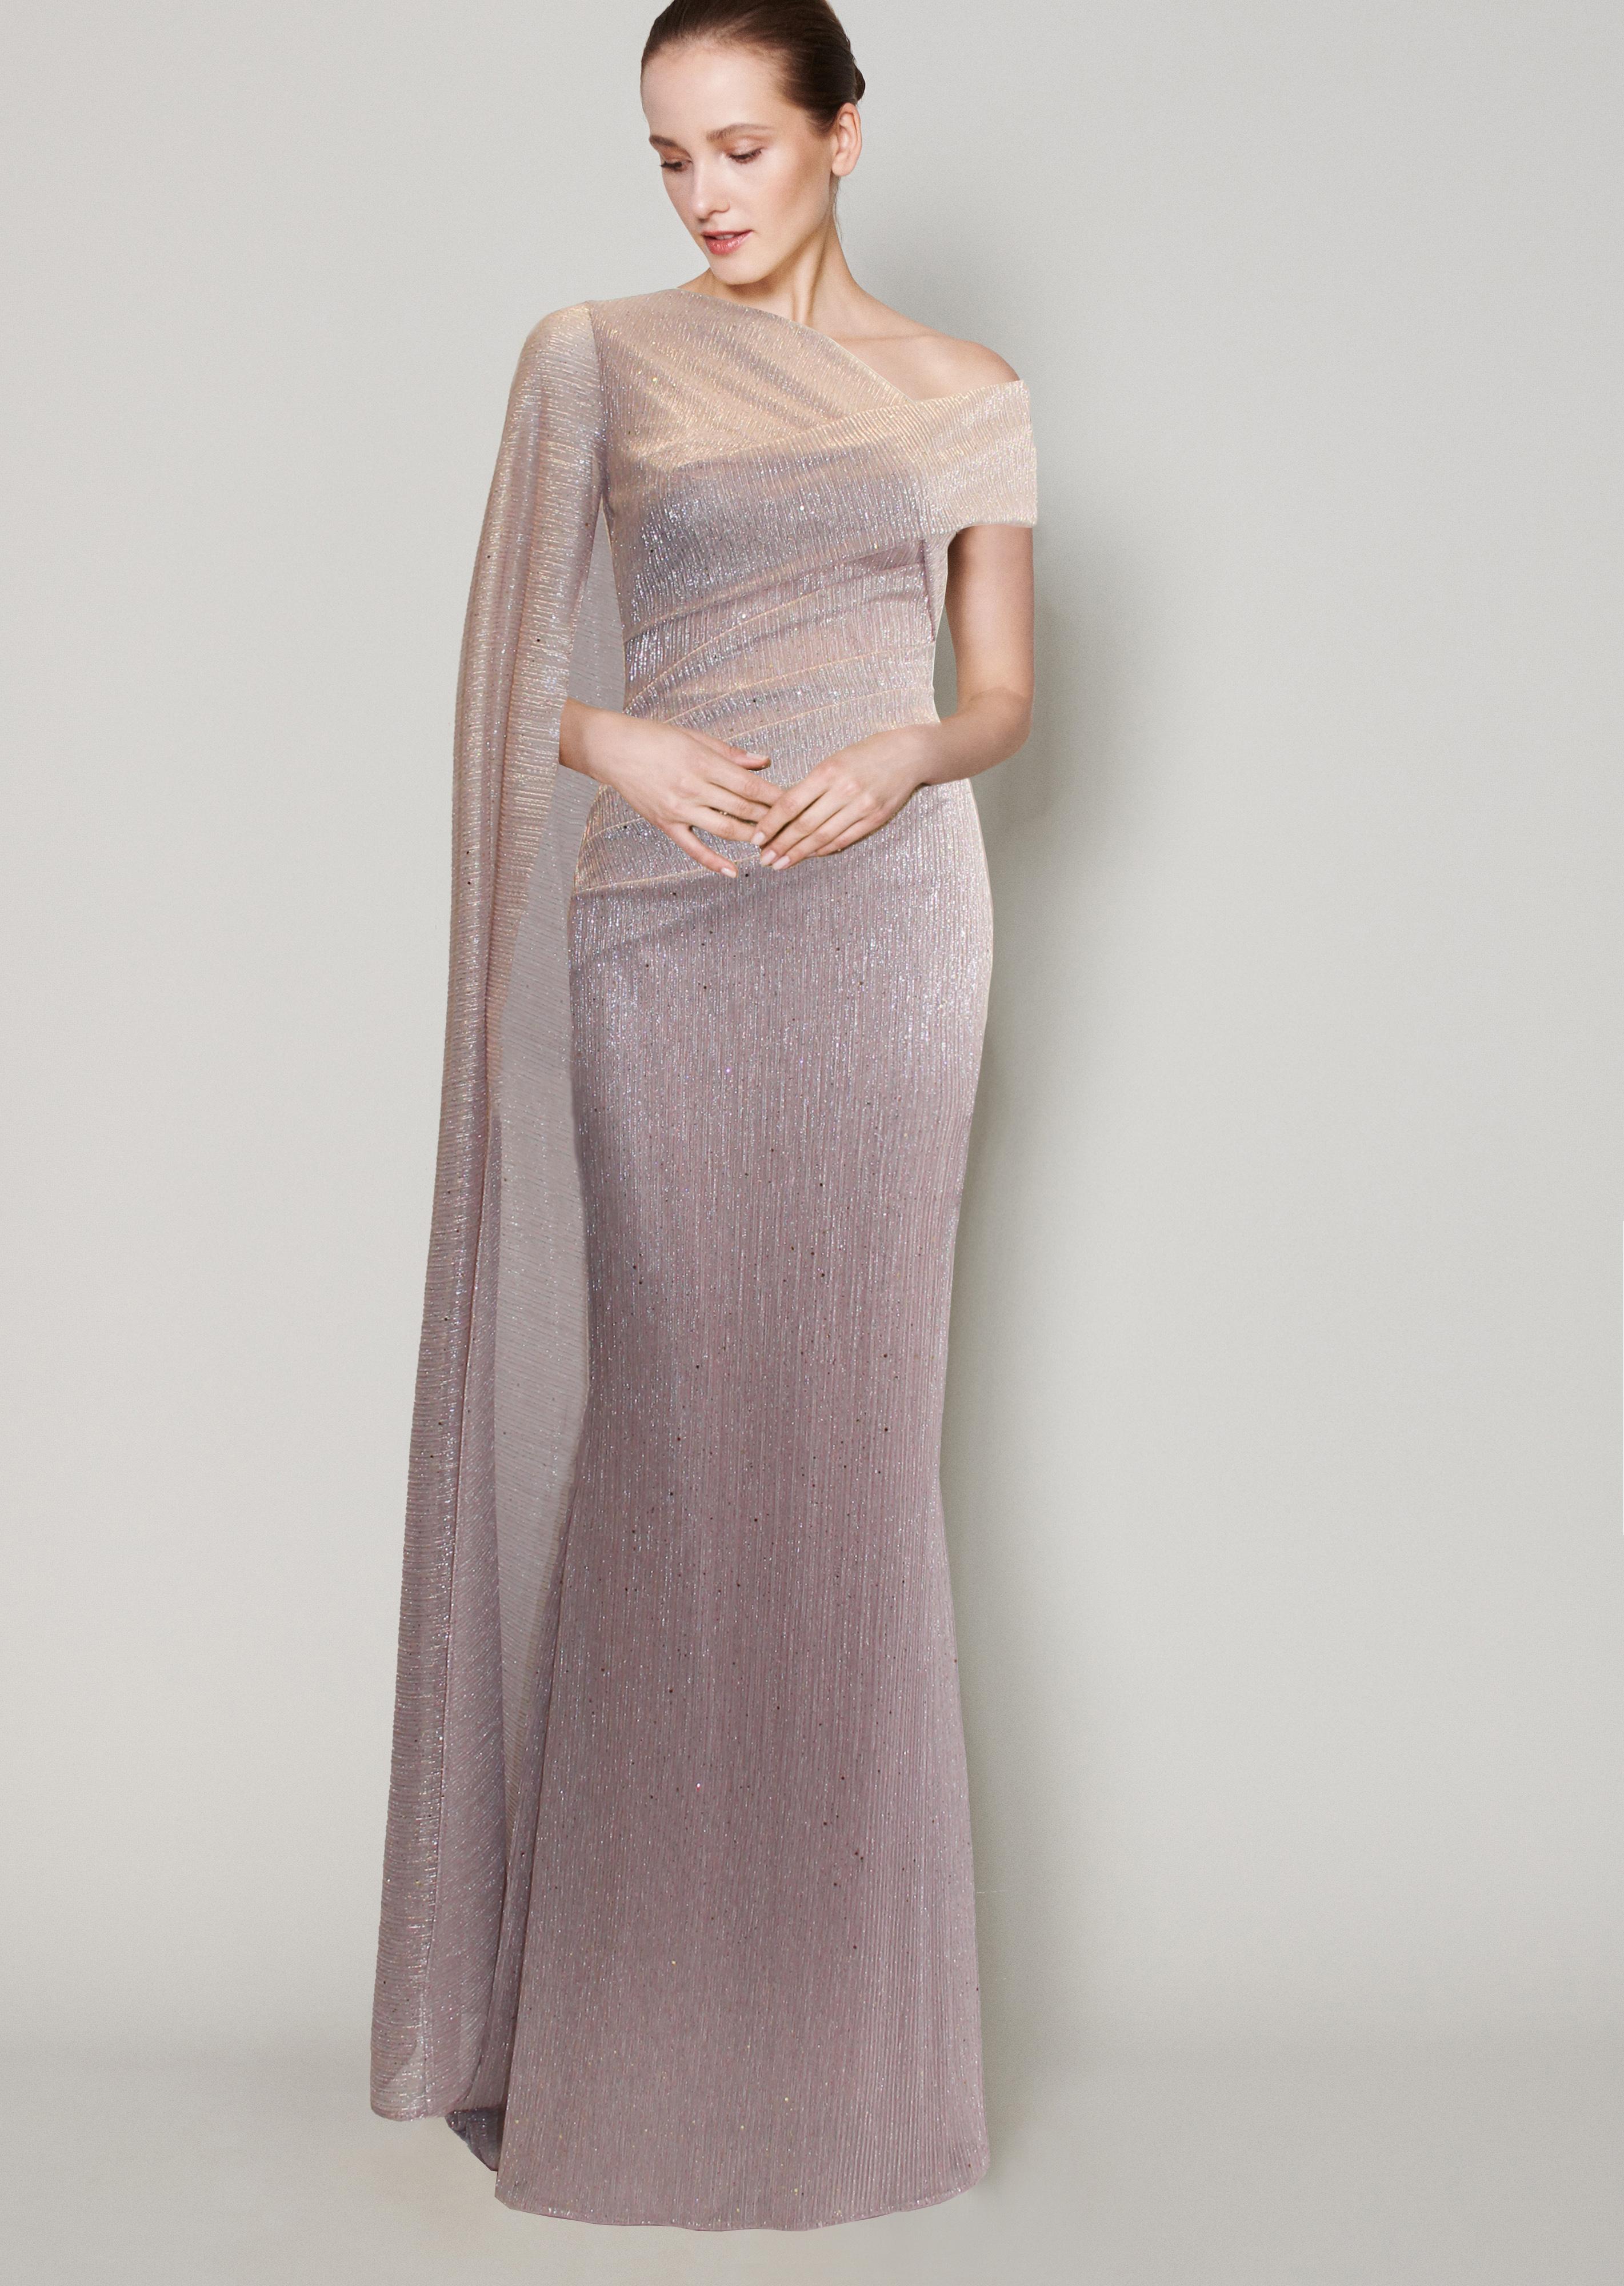 evening dress rosedale7